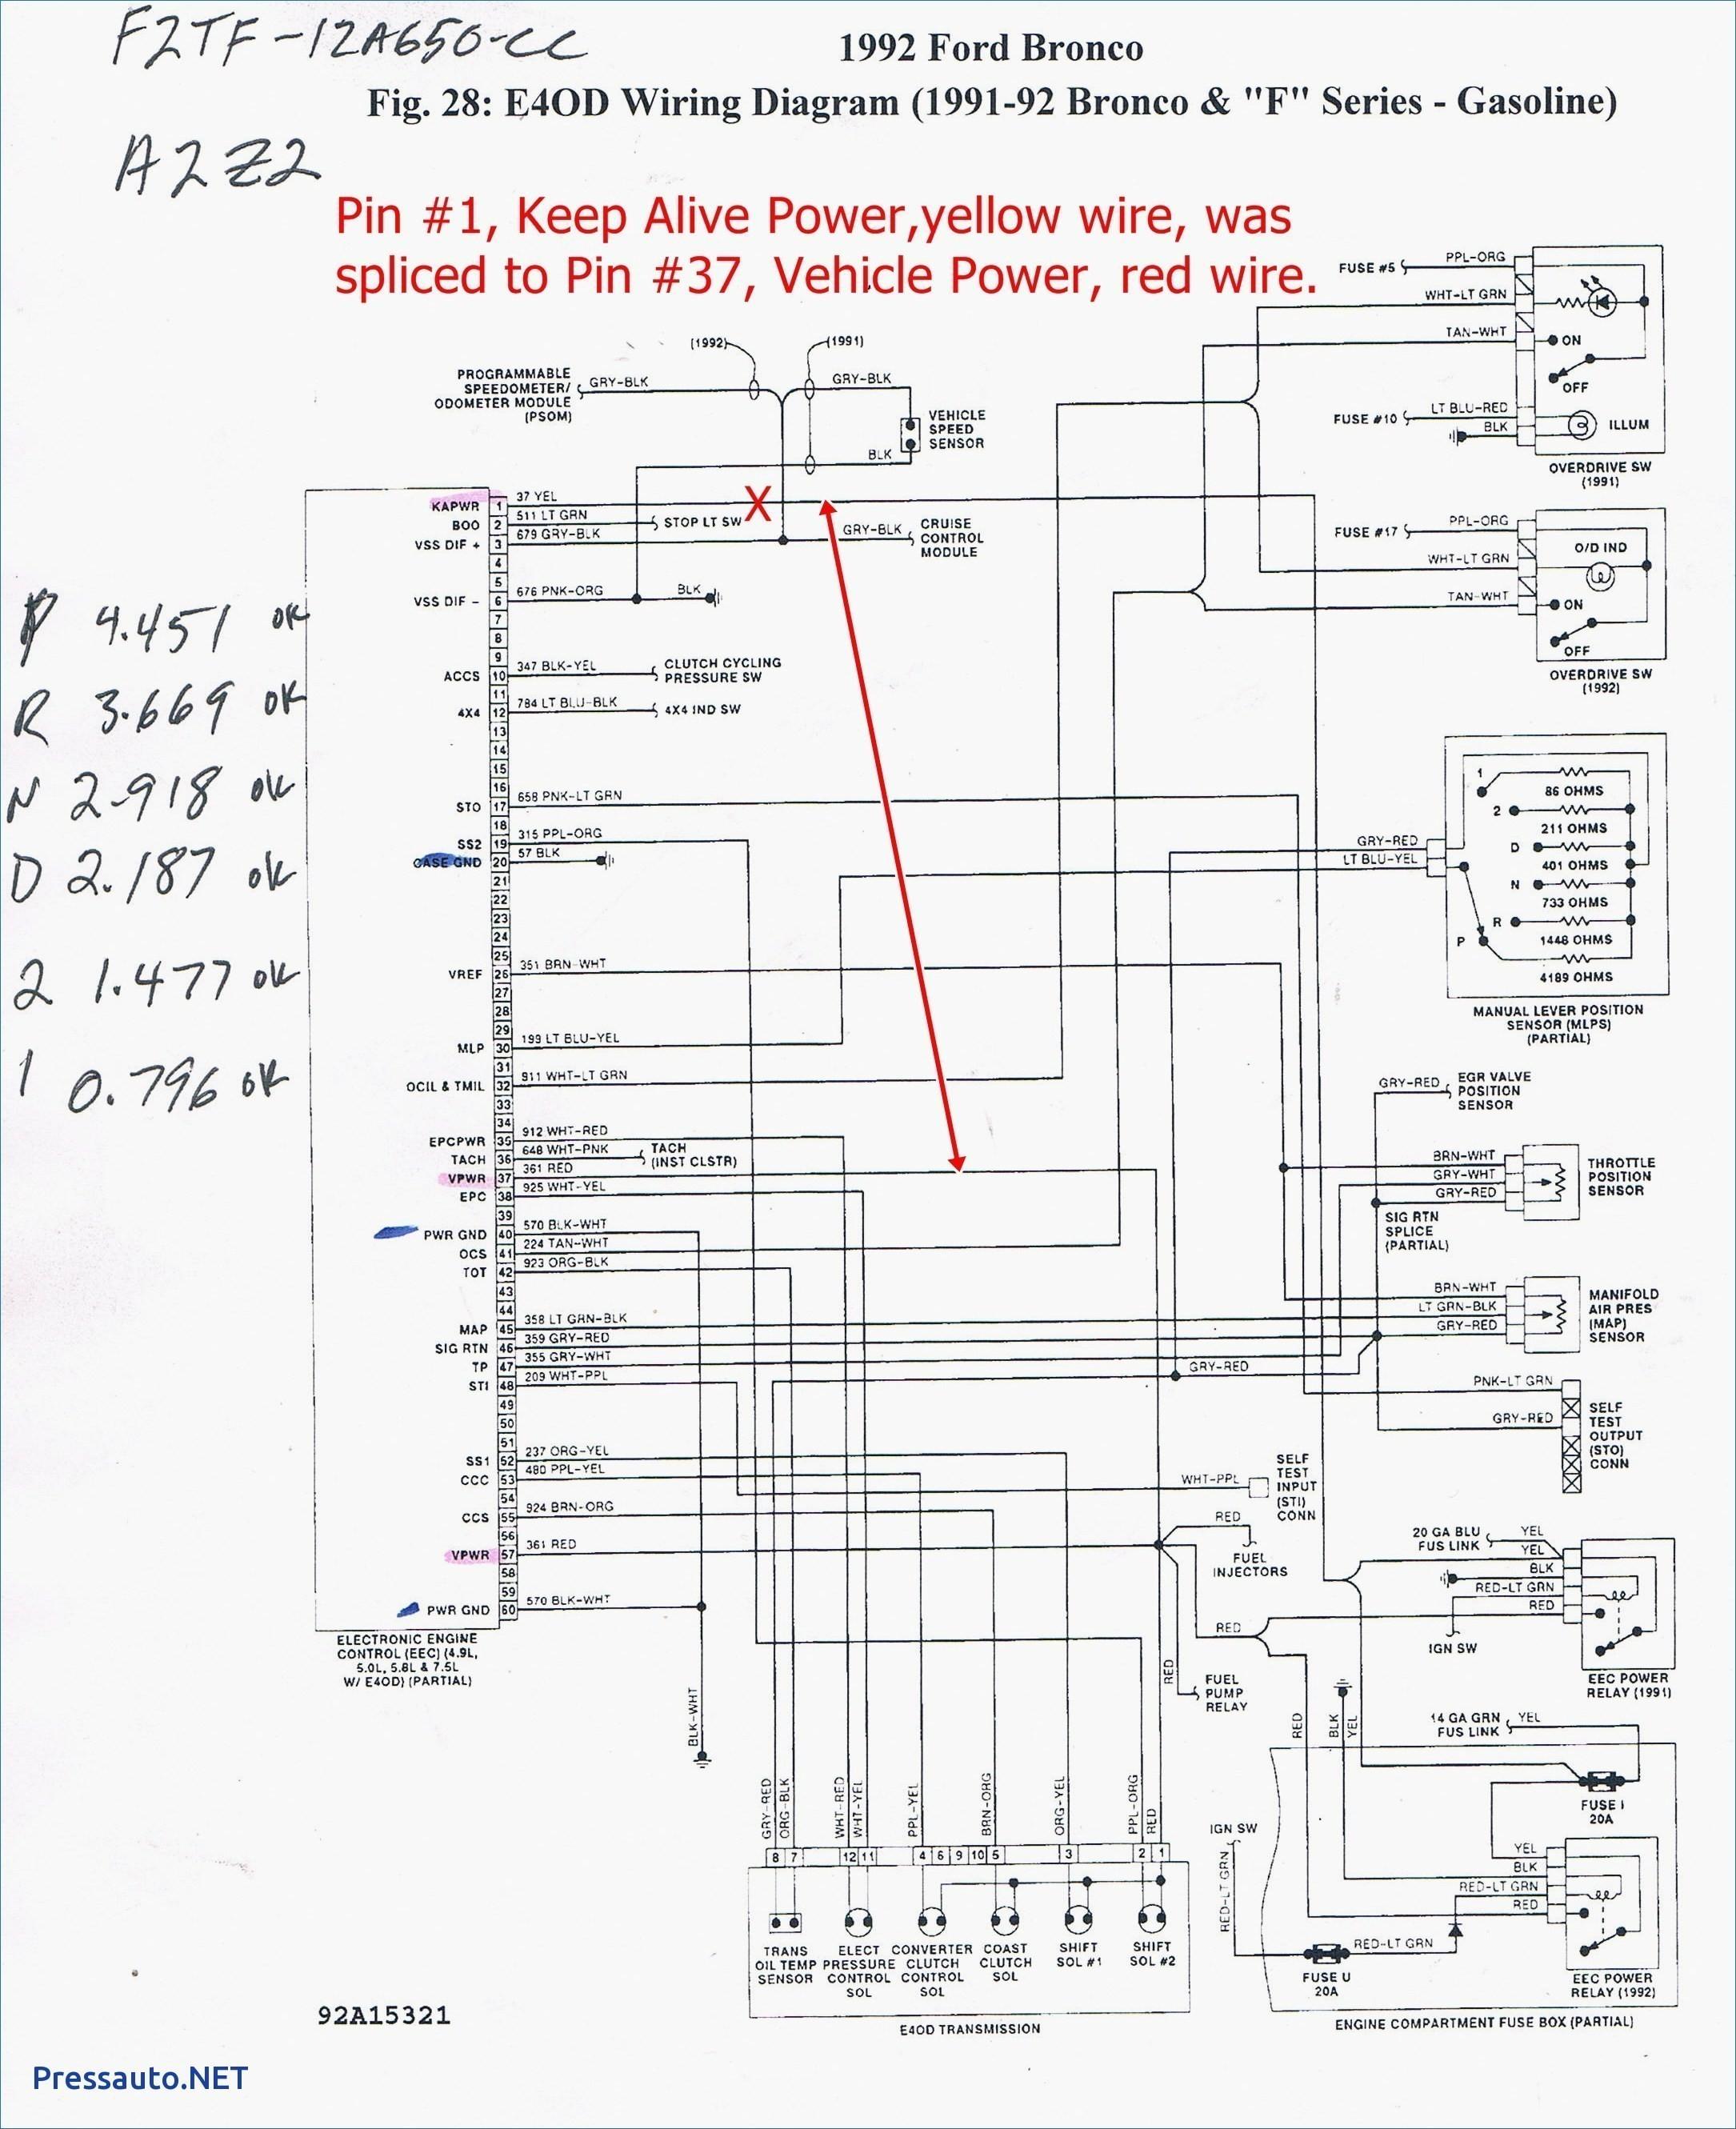 Best of 1997 dodge ram 1500 radio wiring diagram wiring diagram image 1997 dodge ram 1500 transmission wiring diagram valid stereo wiring diagram for 1997 dodge ram 1500 asfbconference2016 Images